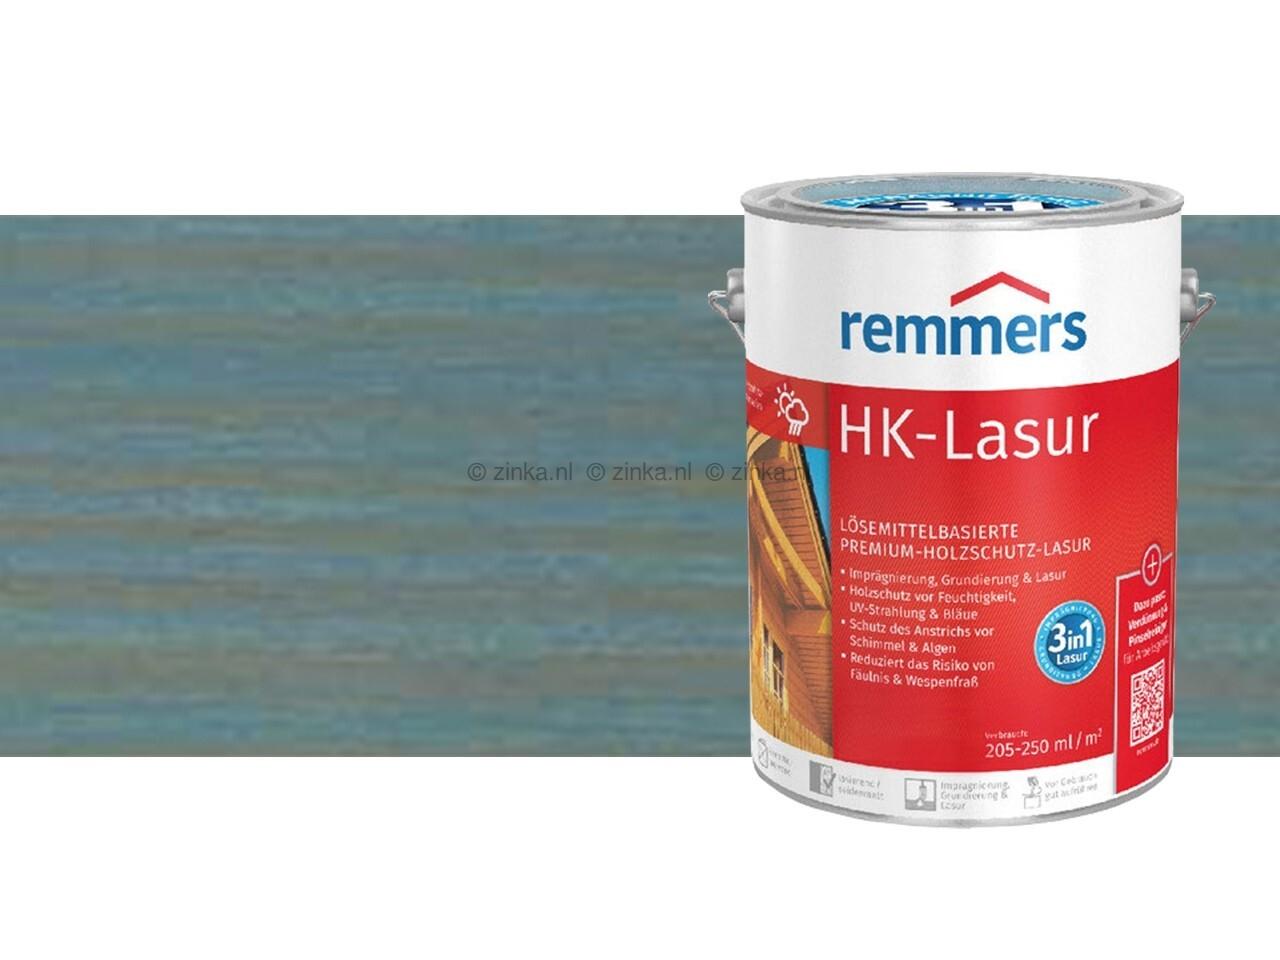 HK-Lazuur friesen-duifblauw 100 ml proefverpakking